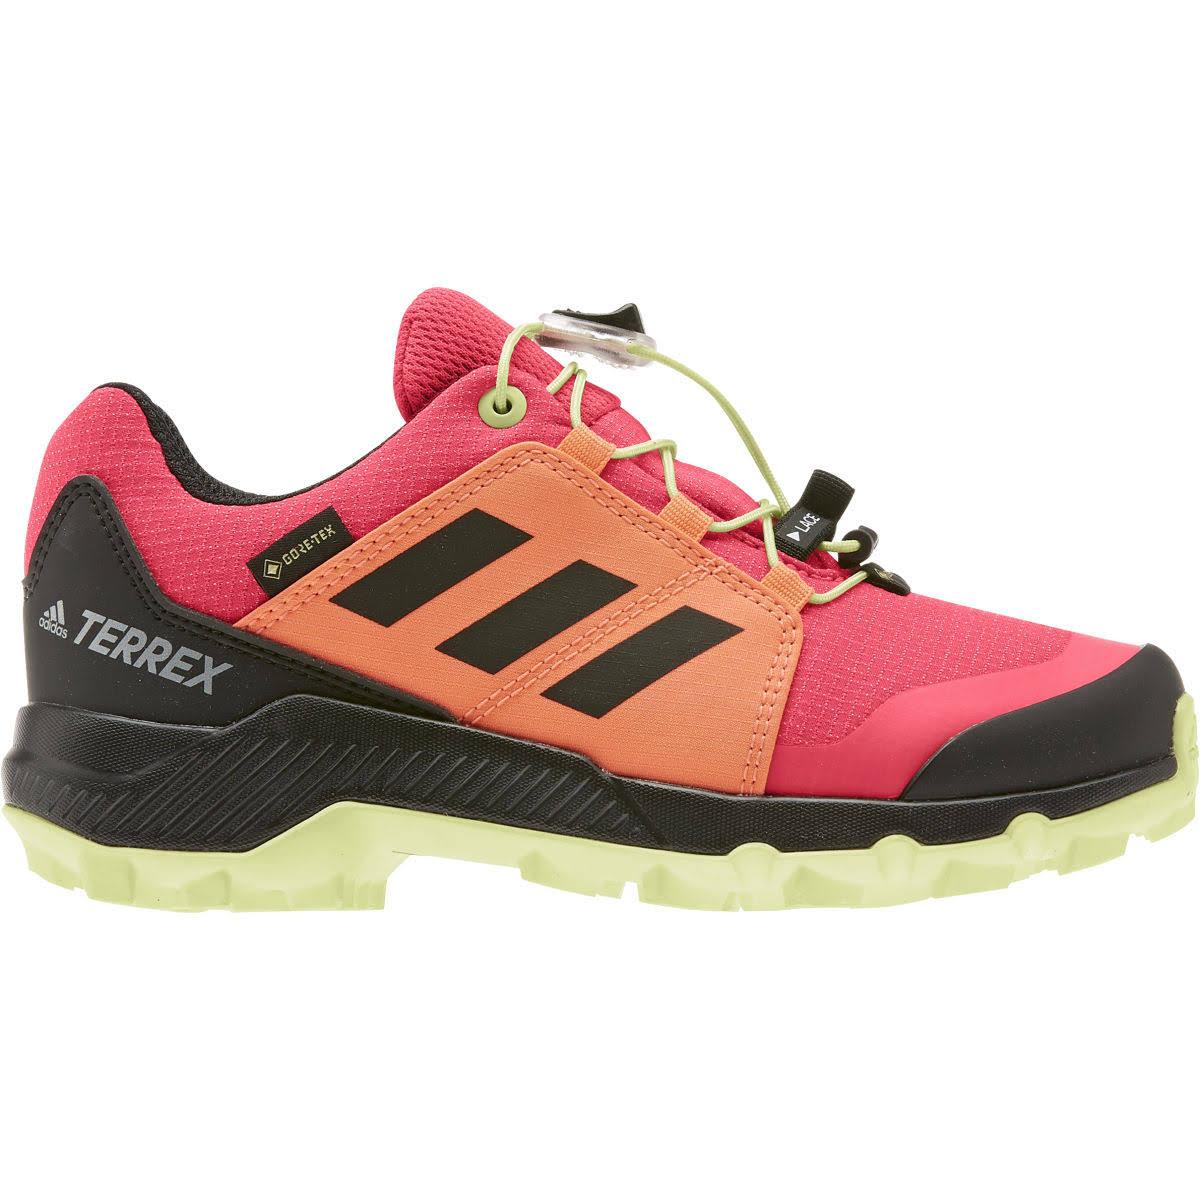 Adidas Terrex Gore-Tex Hiking Shoes Hiking - Kids - Red